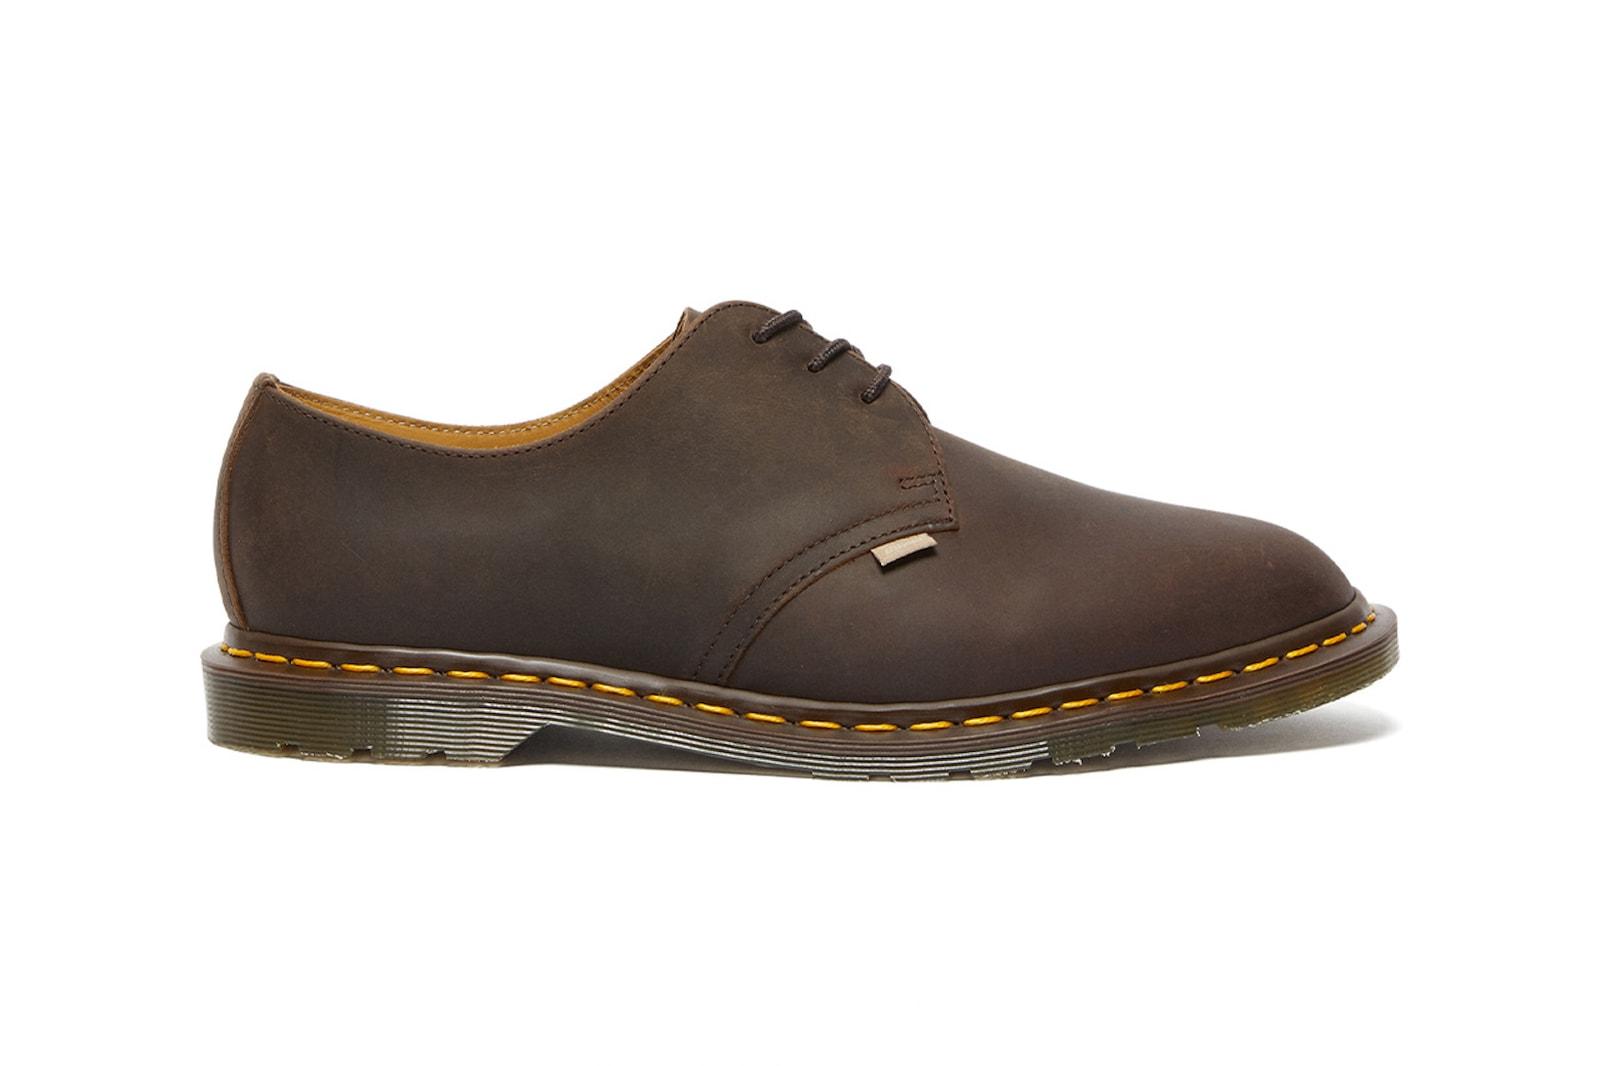 dr martens jjjjound spring summer 2021 collaboration archie ii shoes black brown